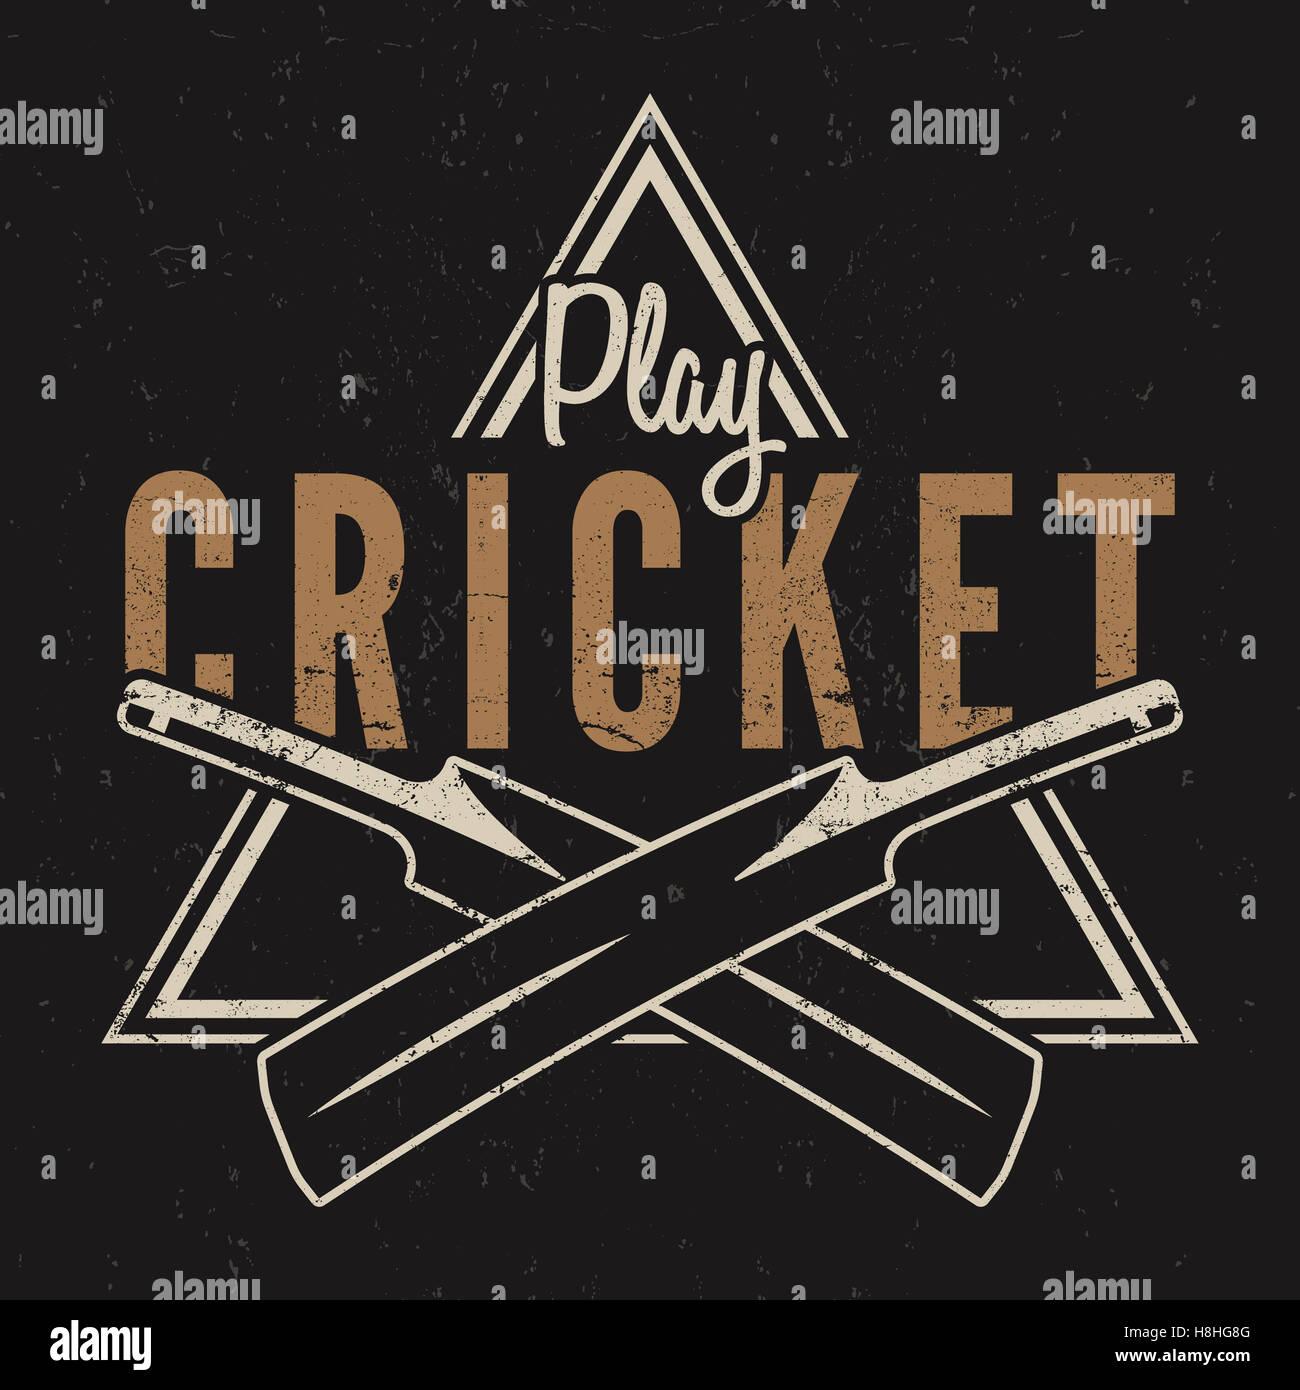 Shirt design equipment - Retro Cricket Emblem Design Logo Icon Badge Sports Symbols With Gear Equipment Tee Shirt T Prints Style